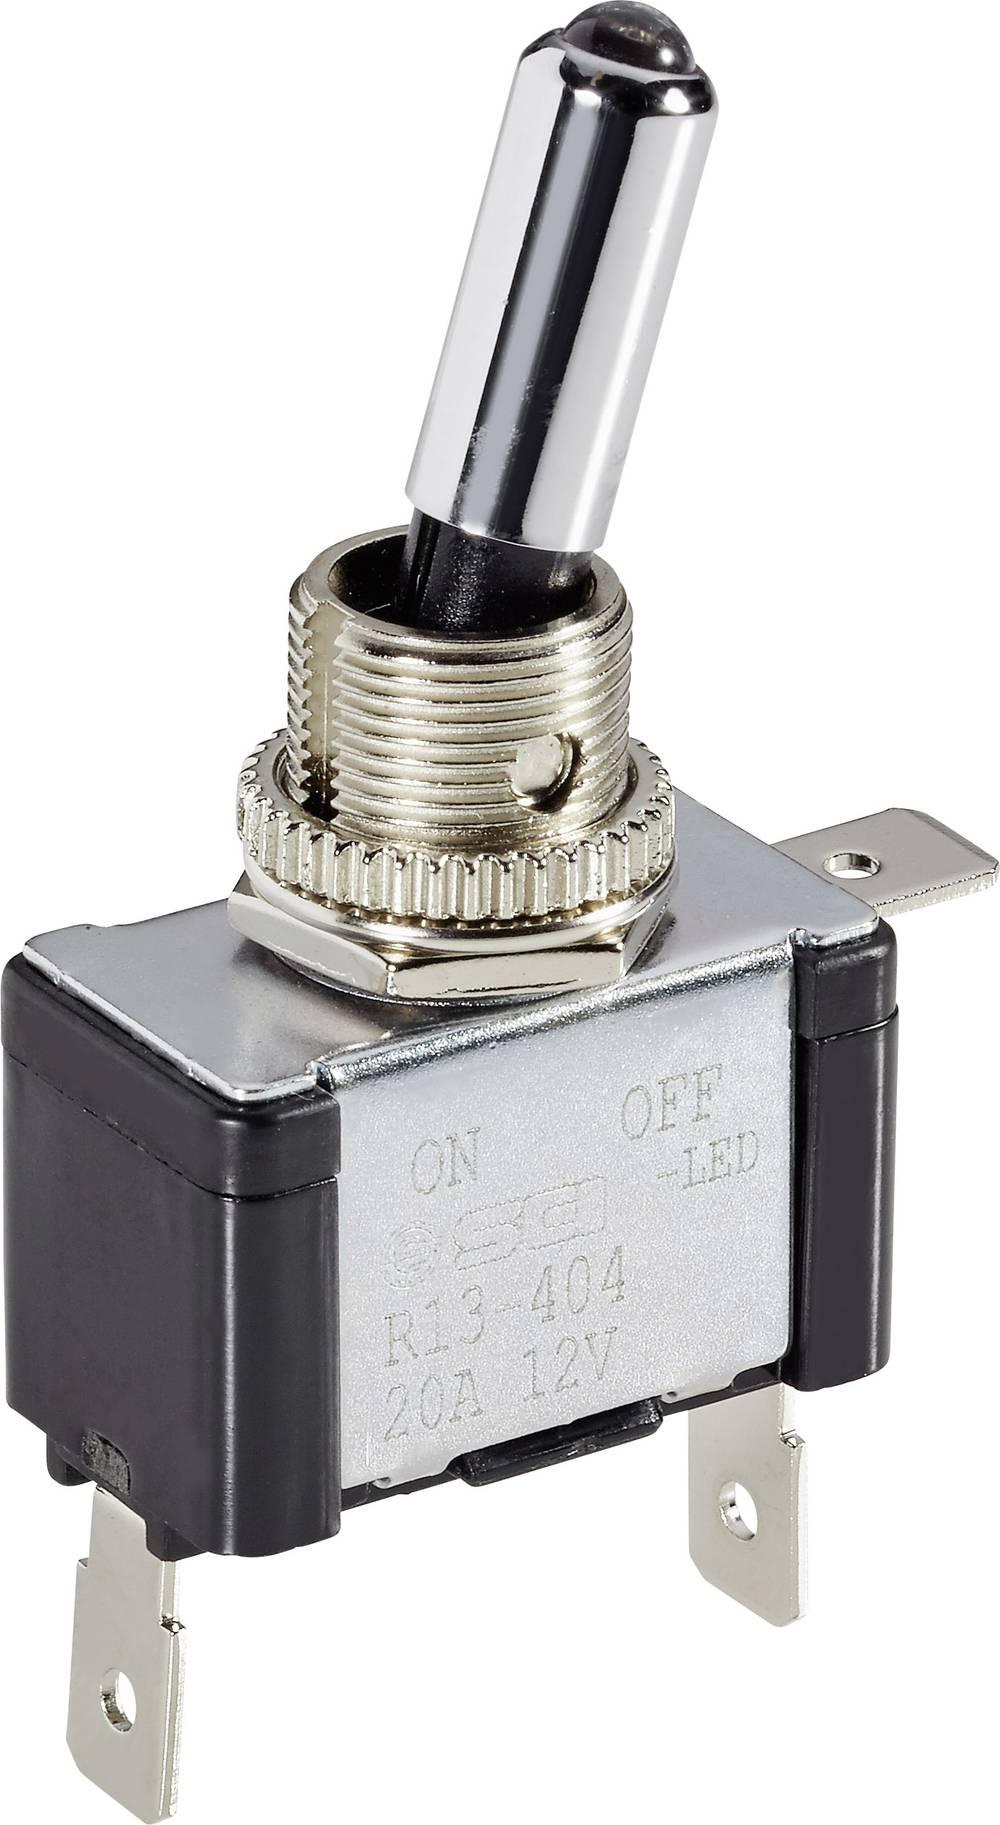 Avtomobilsko prevesno stikalo 12 V/DC 20 A 1 x izklop/vklop zaskočno TRU Components TC-R13-404L BL LED 1 kos